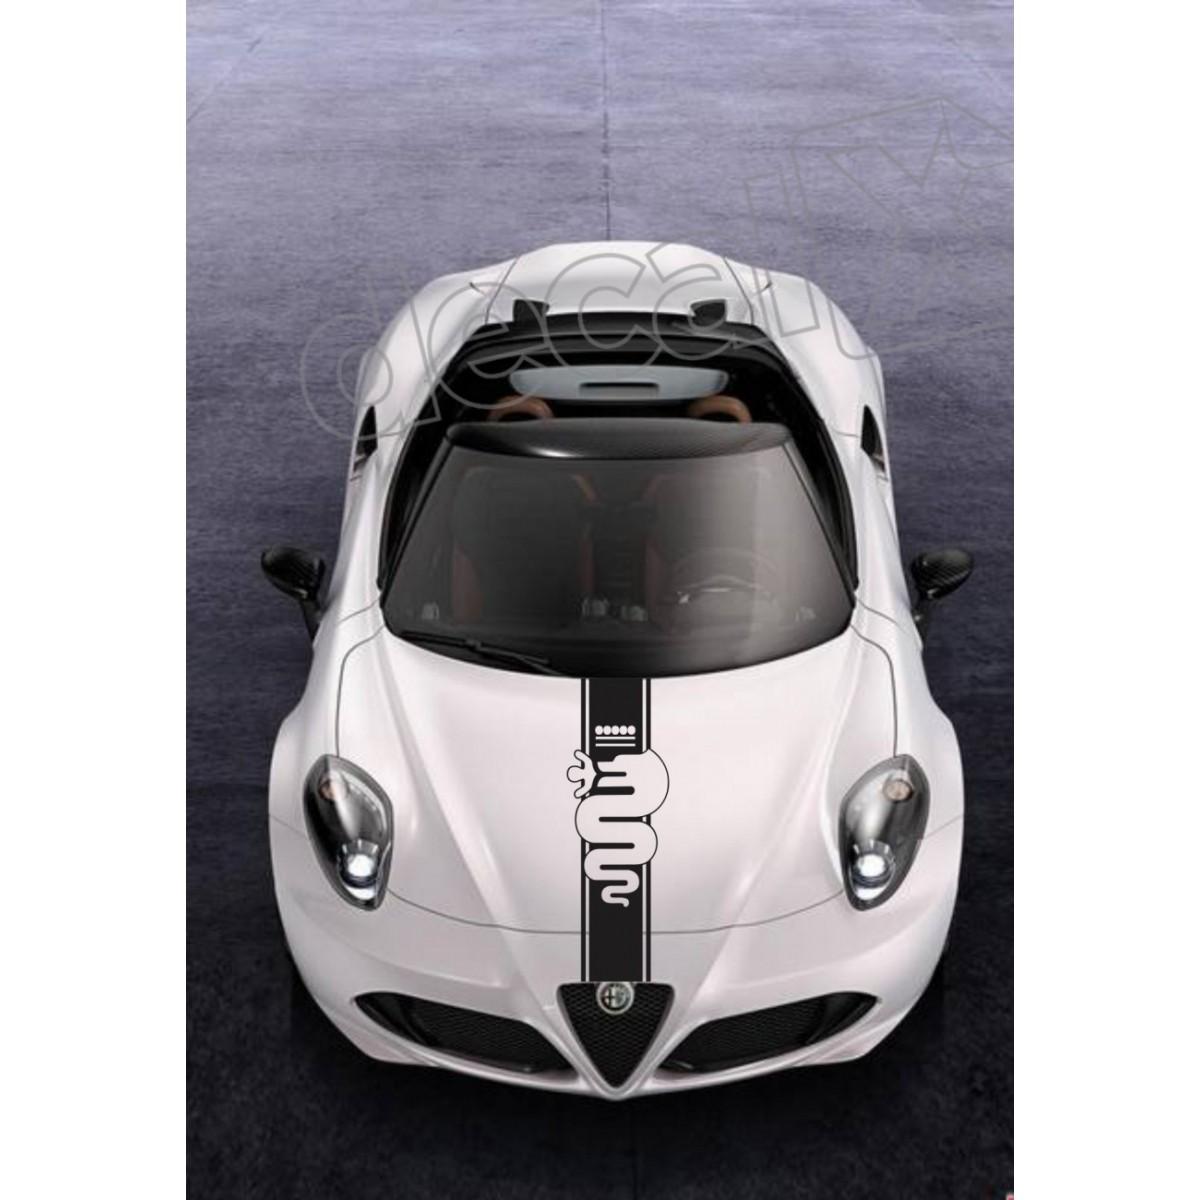 Adesivo Alfa Romeo Faixa Capo 3m Ct03